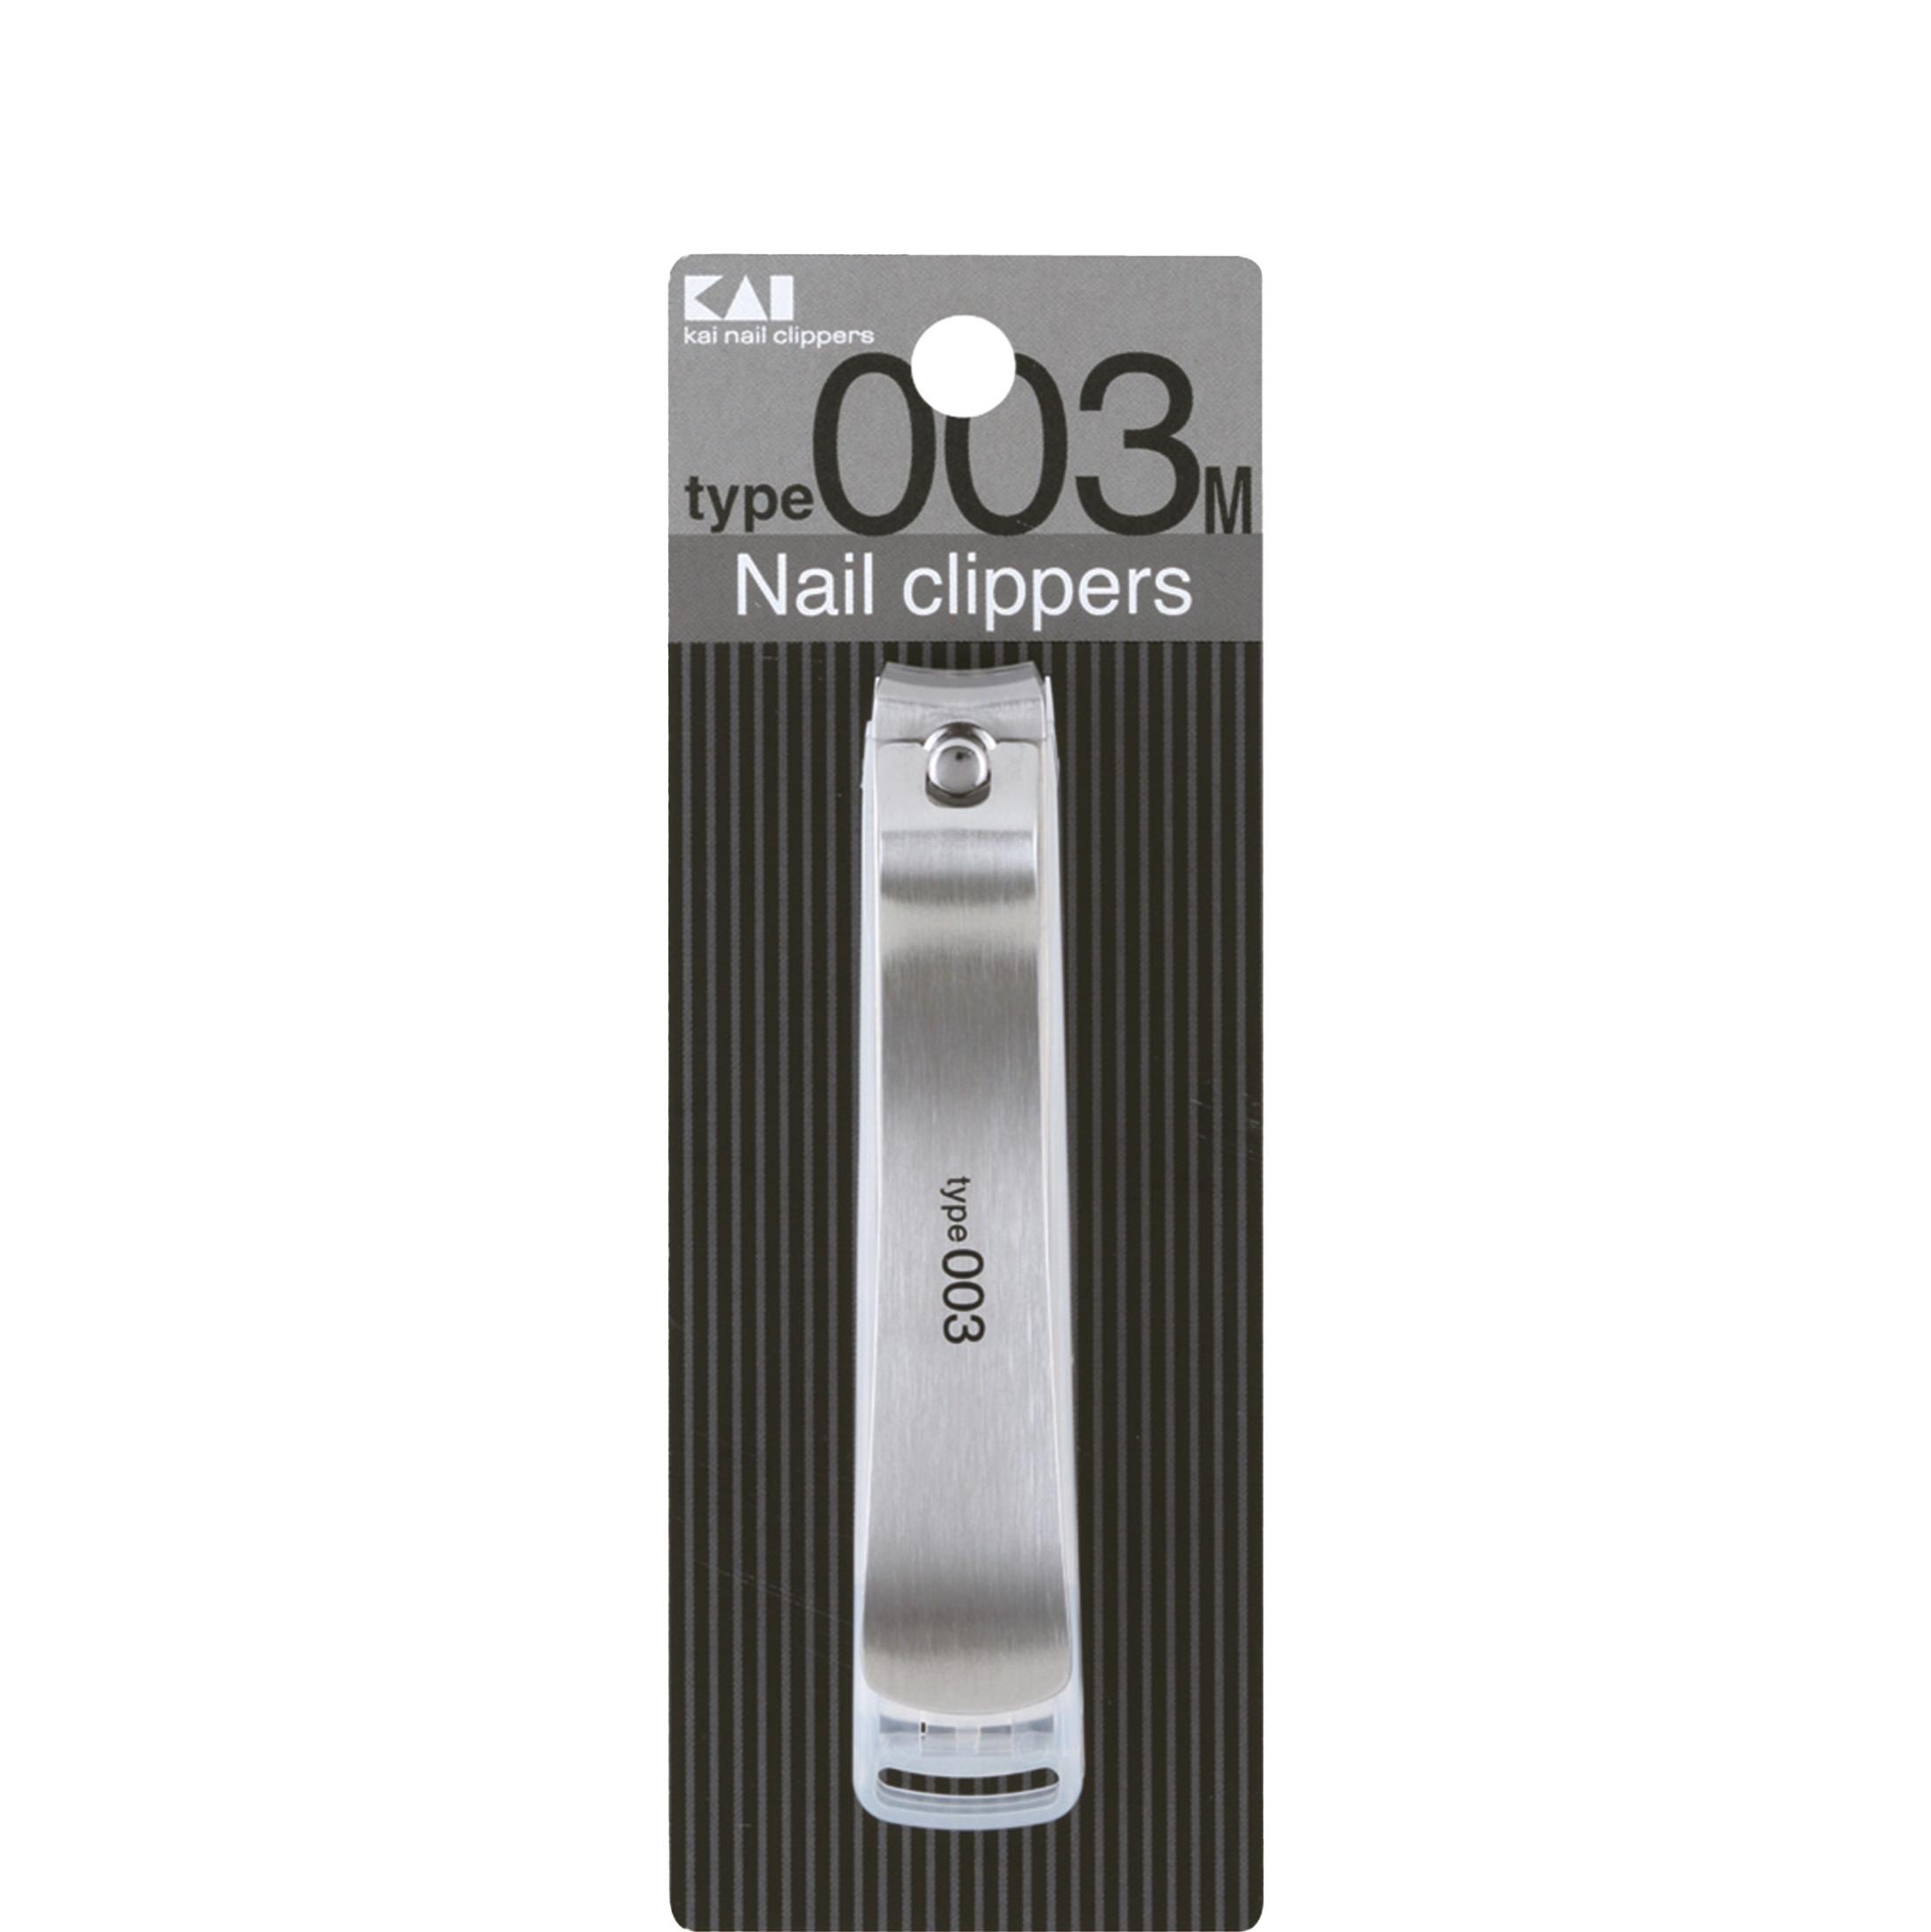 Nagelknipper type 003M - RVS